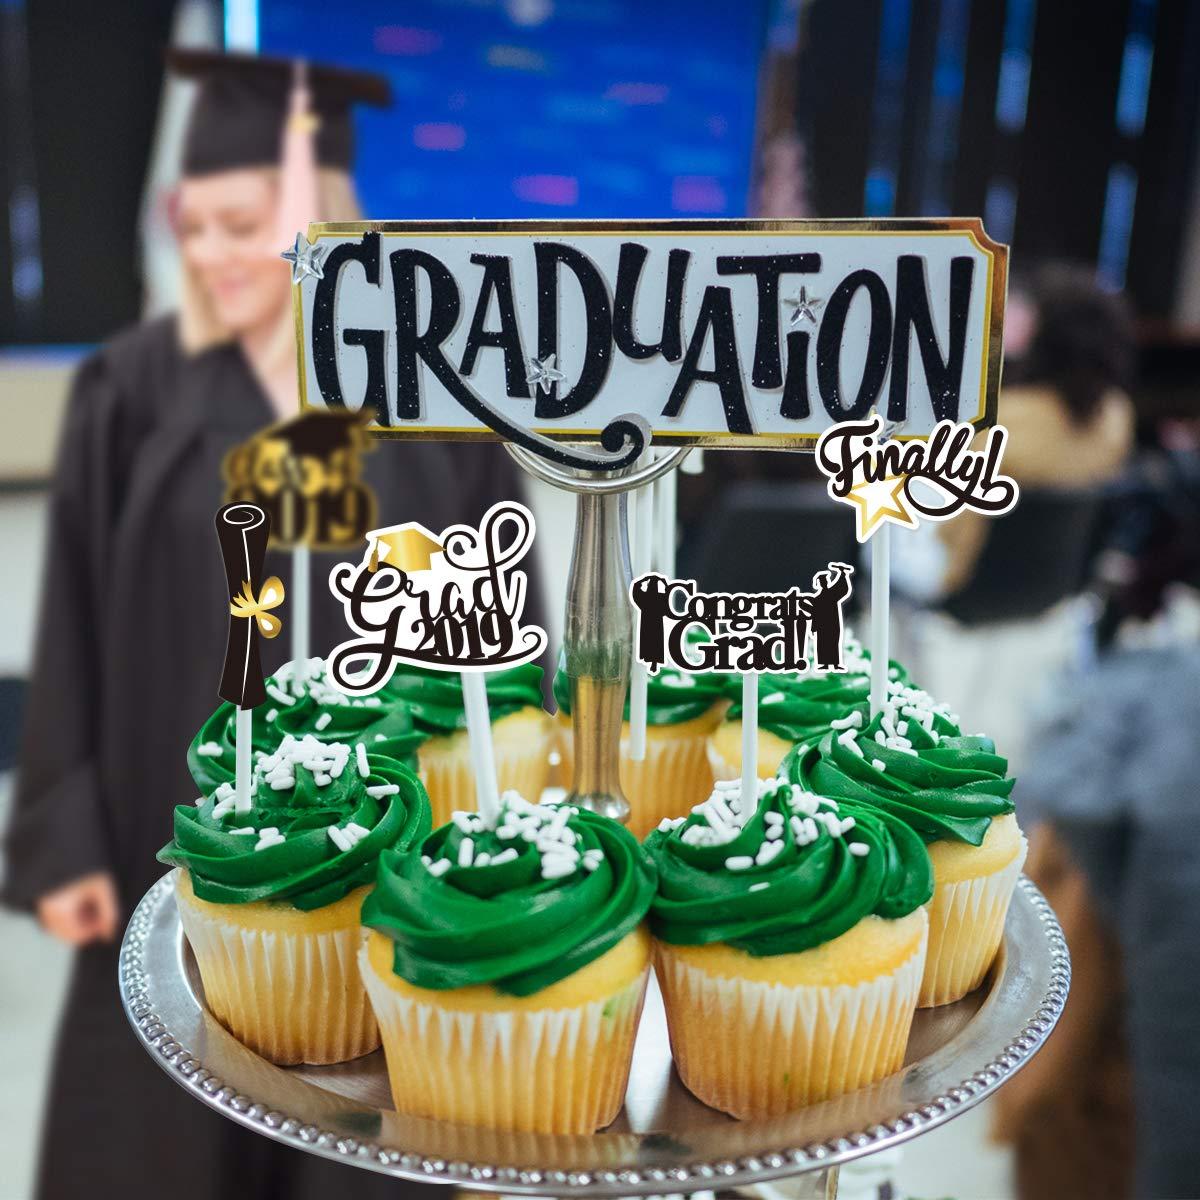 BESTOYARD 72 st/ücke 2019 Abschluss Kuchen Topper Abschlussfeier Cupcake Topper Kuchen Dekorationen Zahnstocher Picks Topper Party Favors